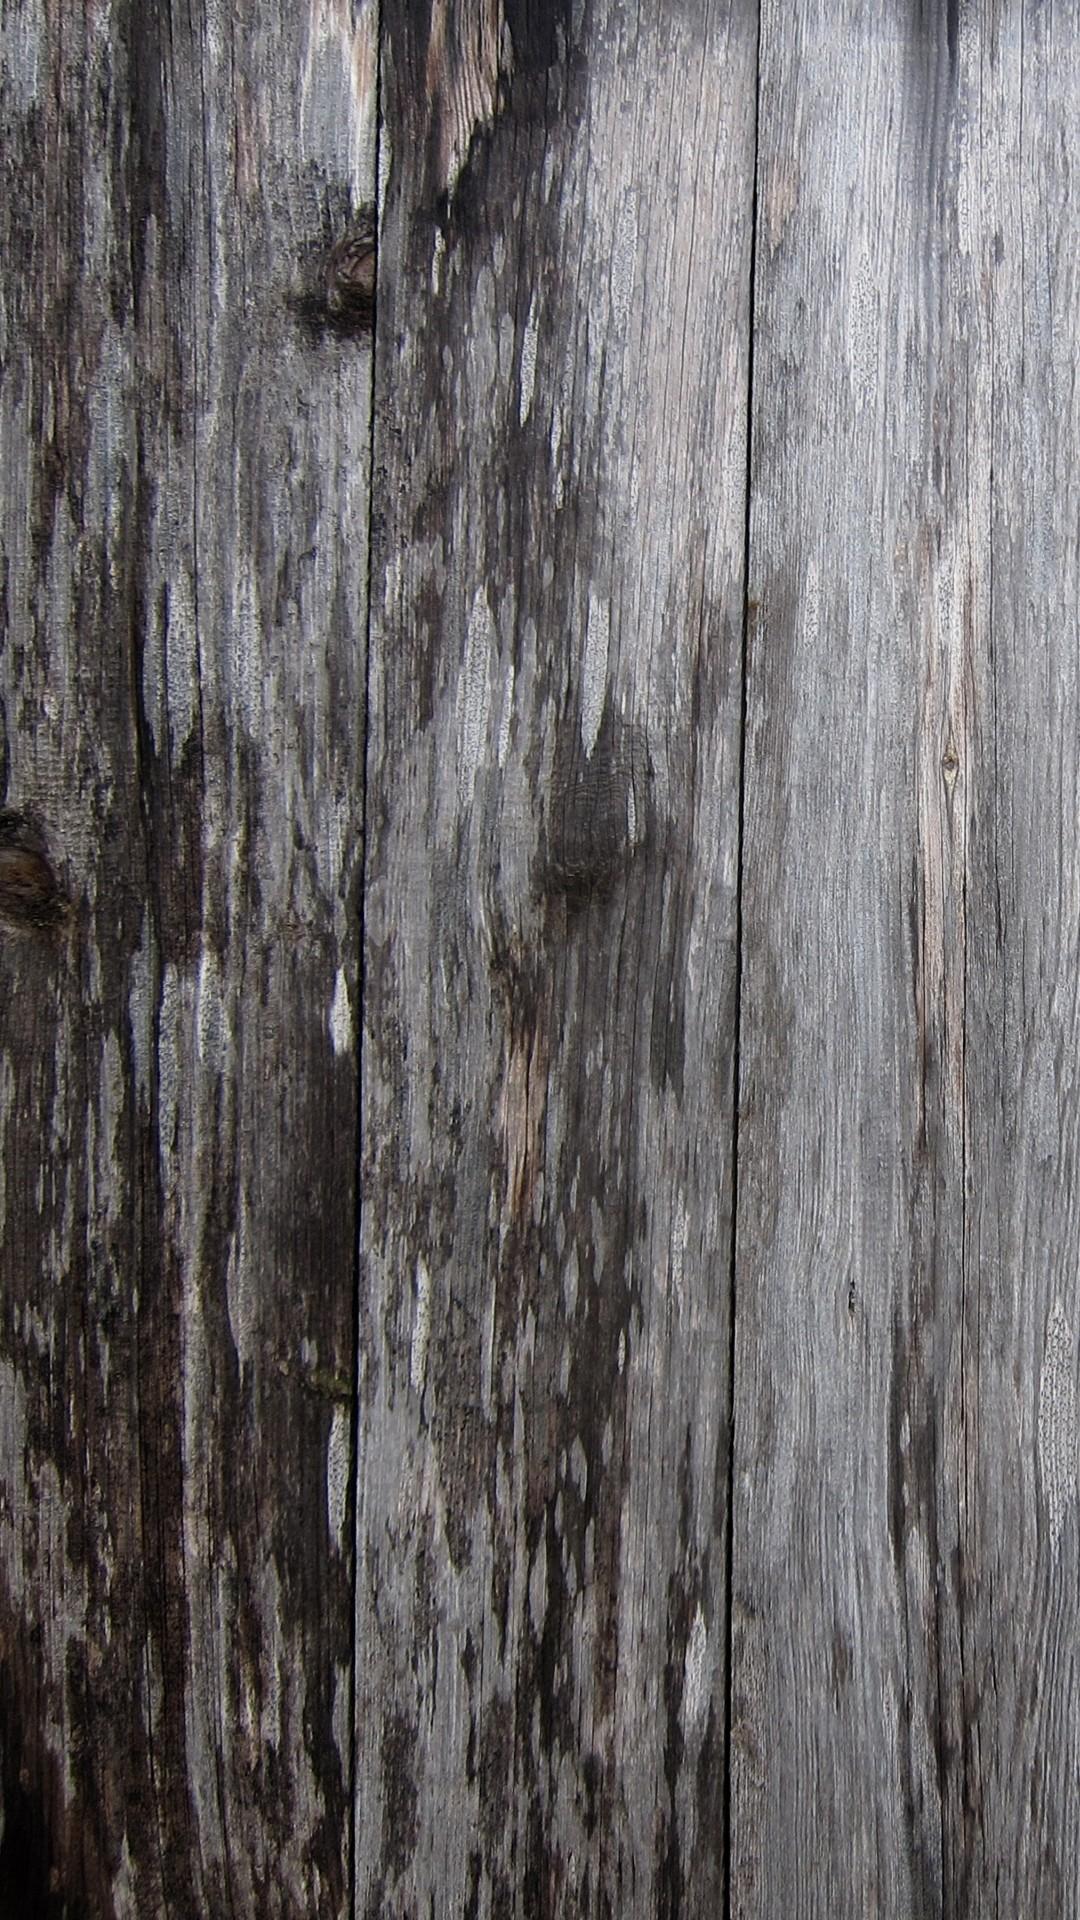 Iphone 6 Plus Wood Wallpaper 83 Images